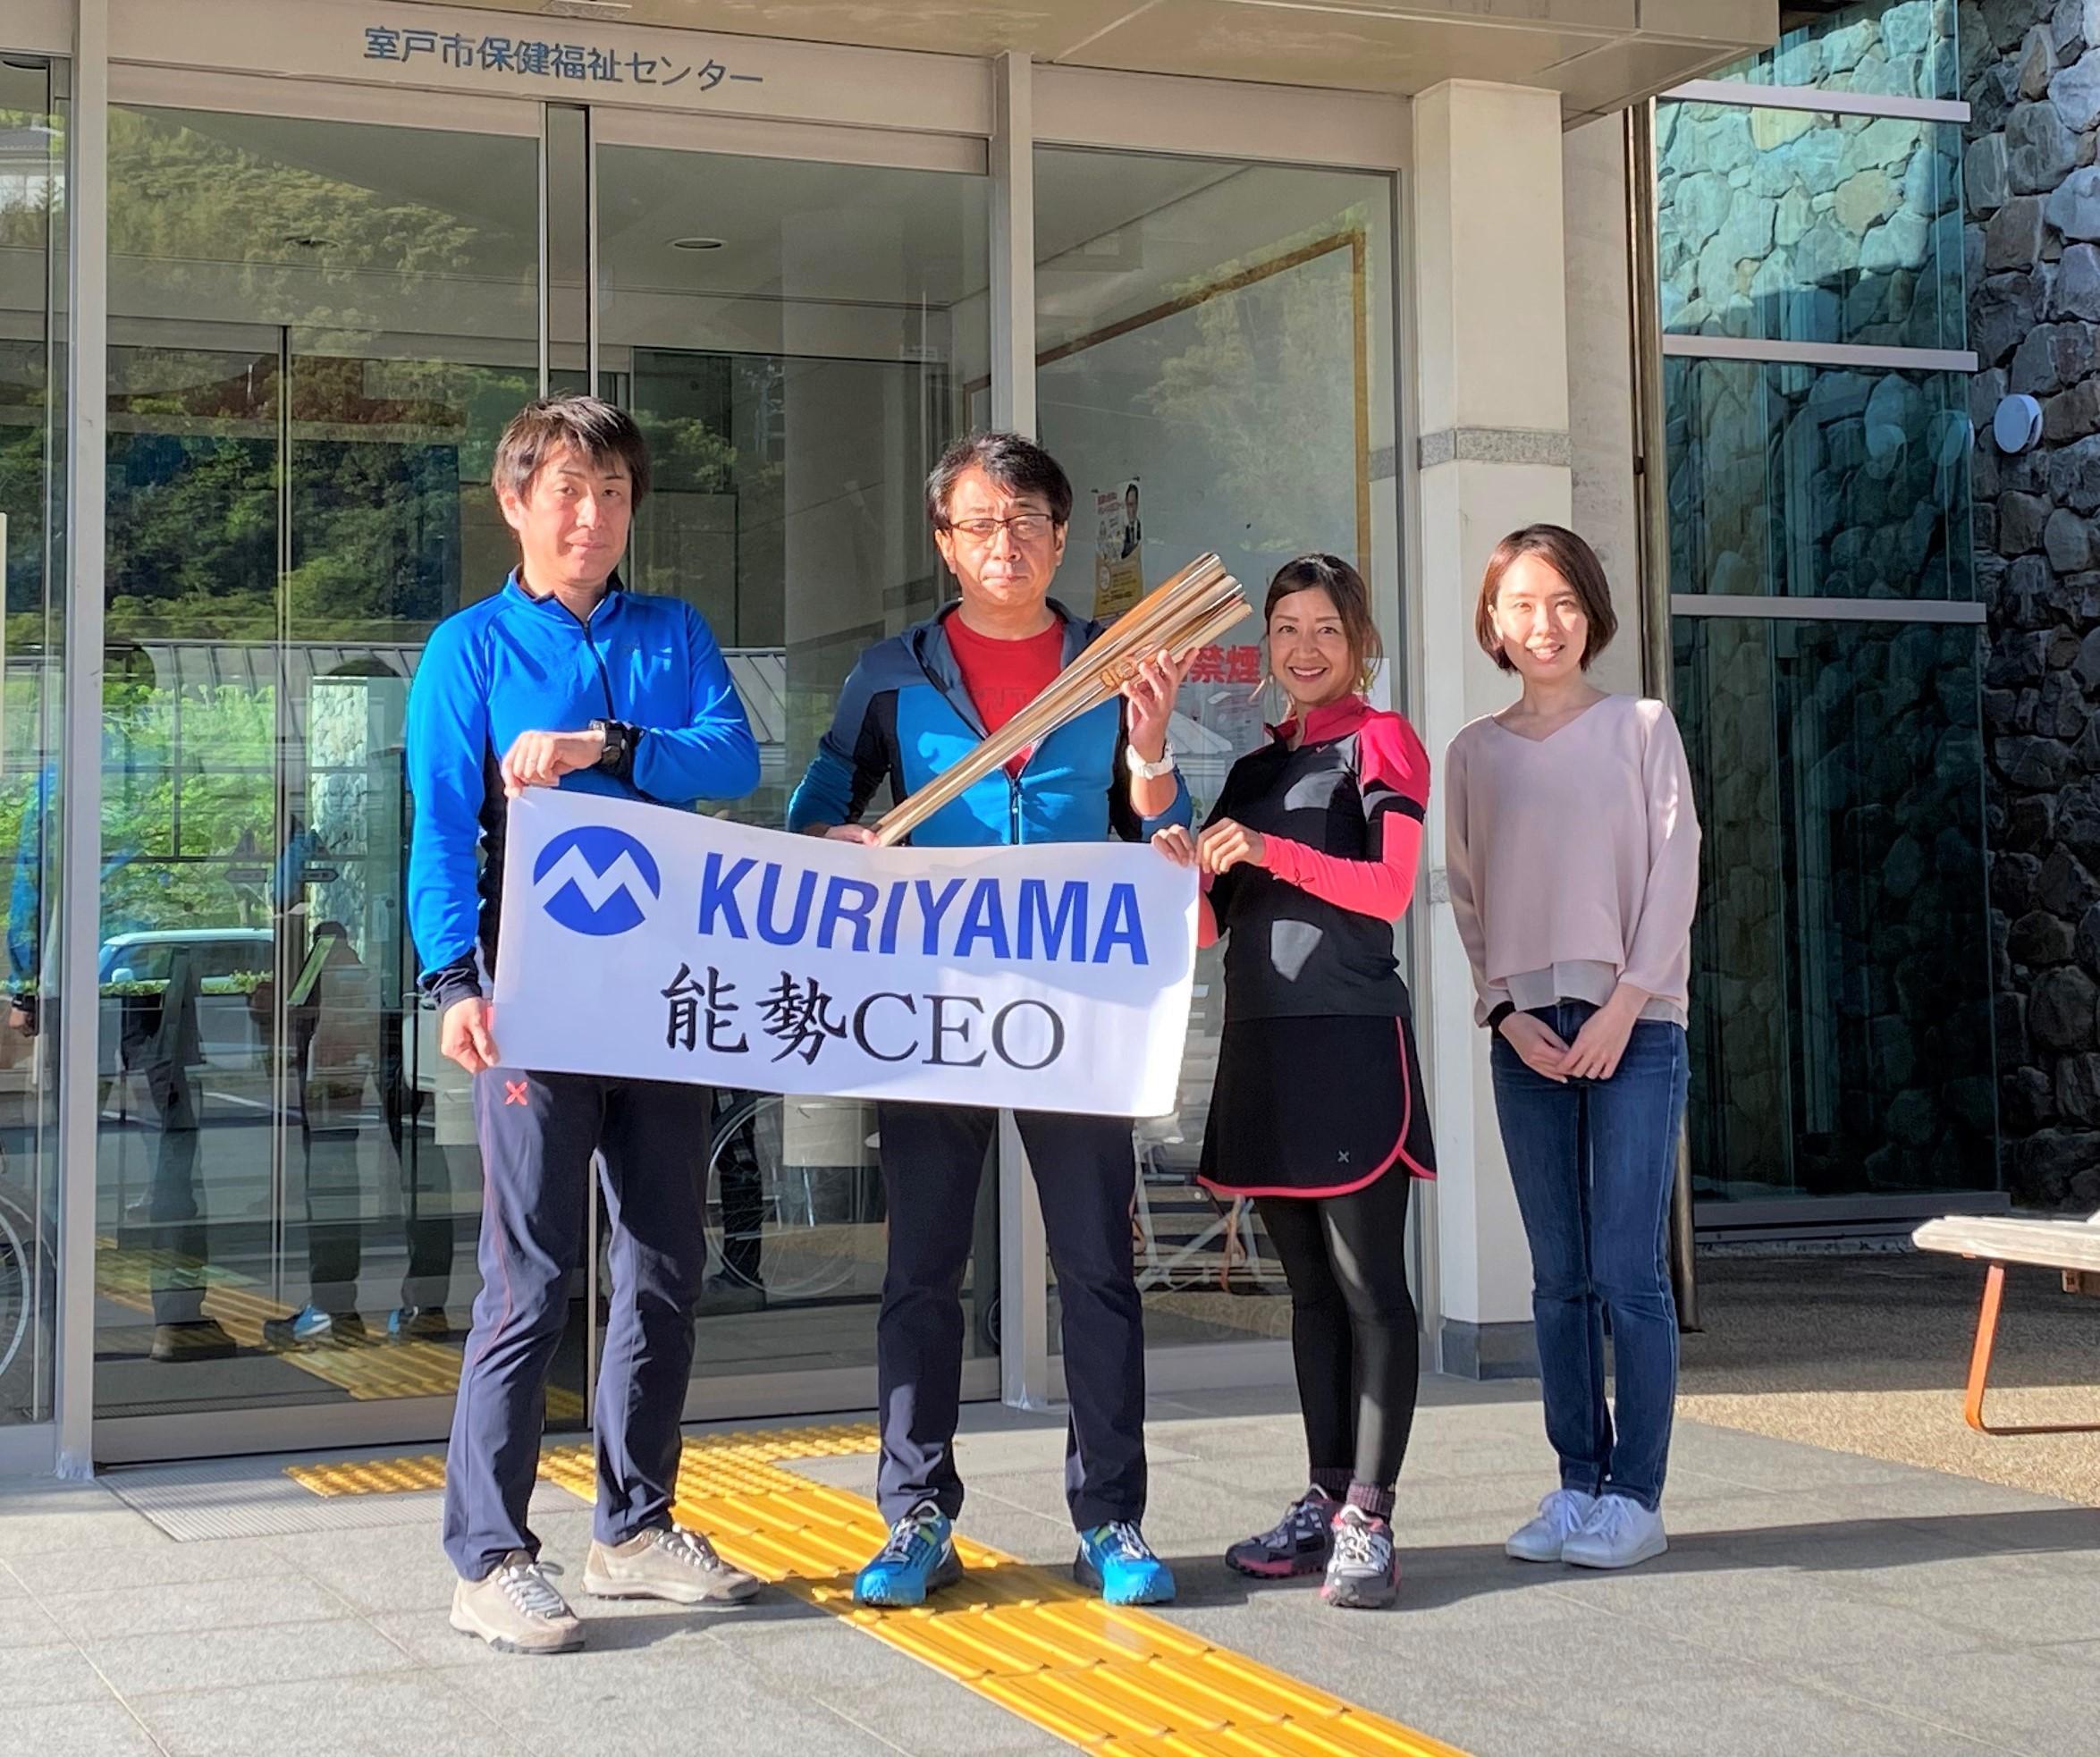 Olympic torch relay KURIYAMA.jpg